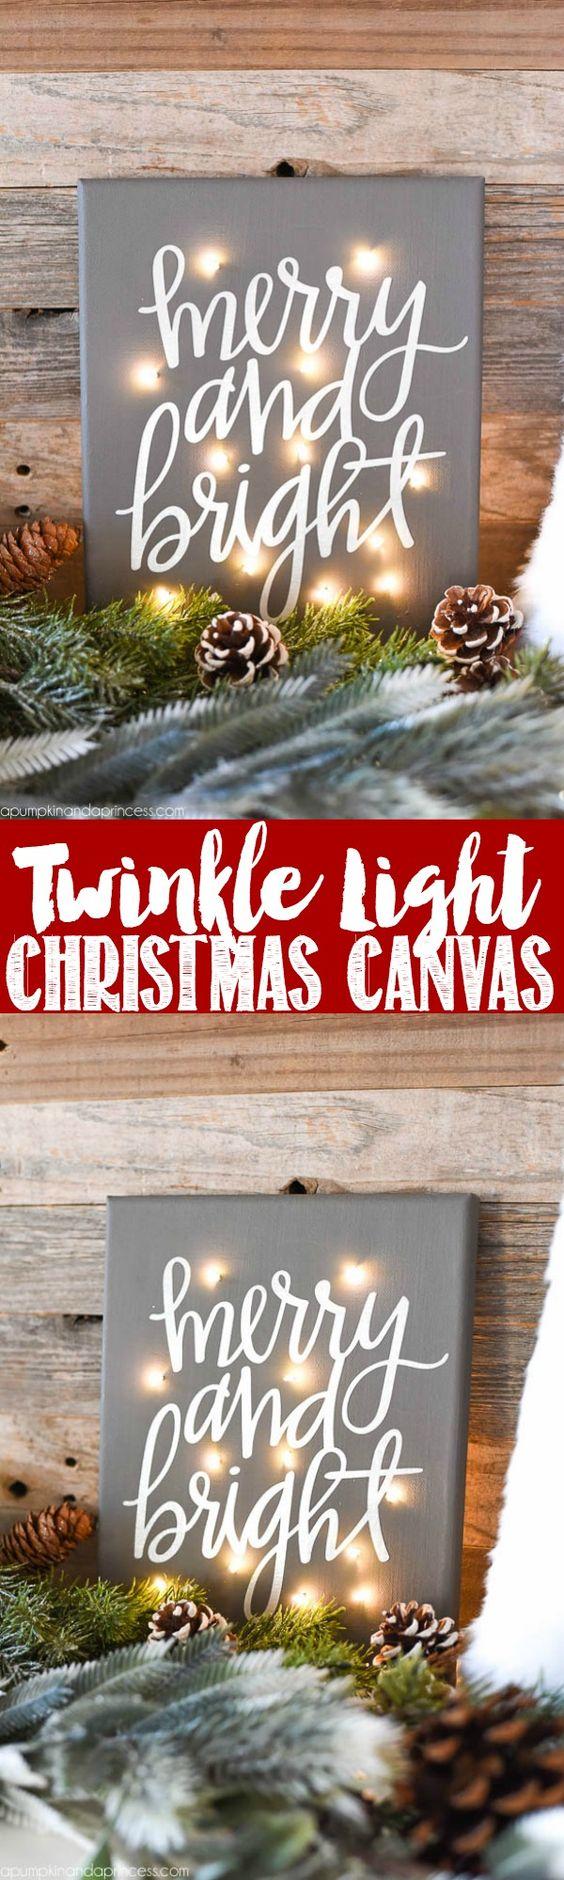 diy twinkle light christmas canvas how to make a merry bright christmas canvas with fairy. Black Bedroom Furniture Sets. Home Design Ideas